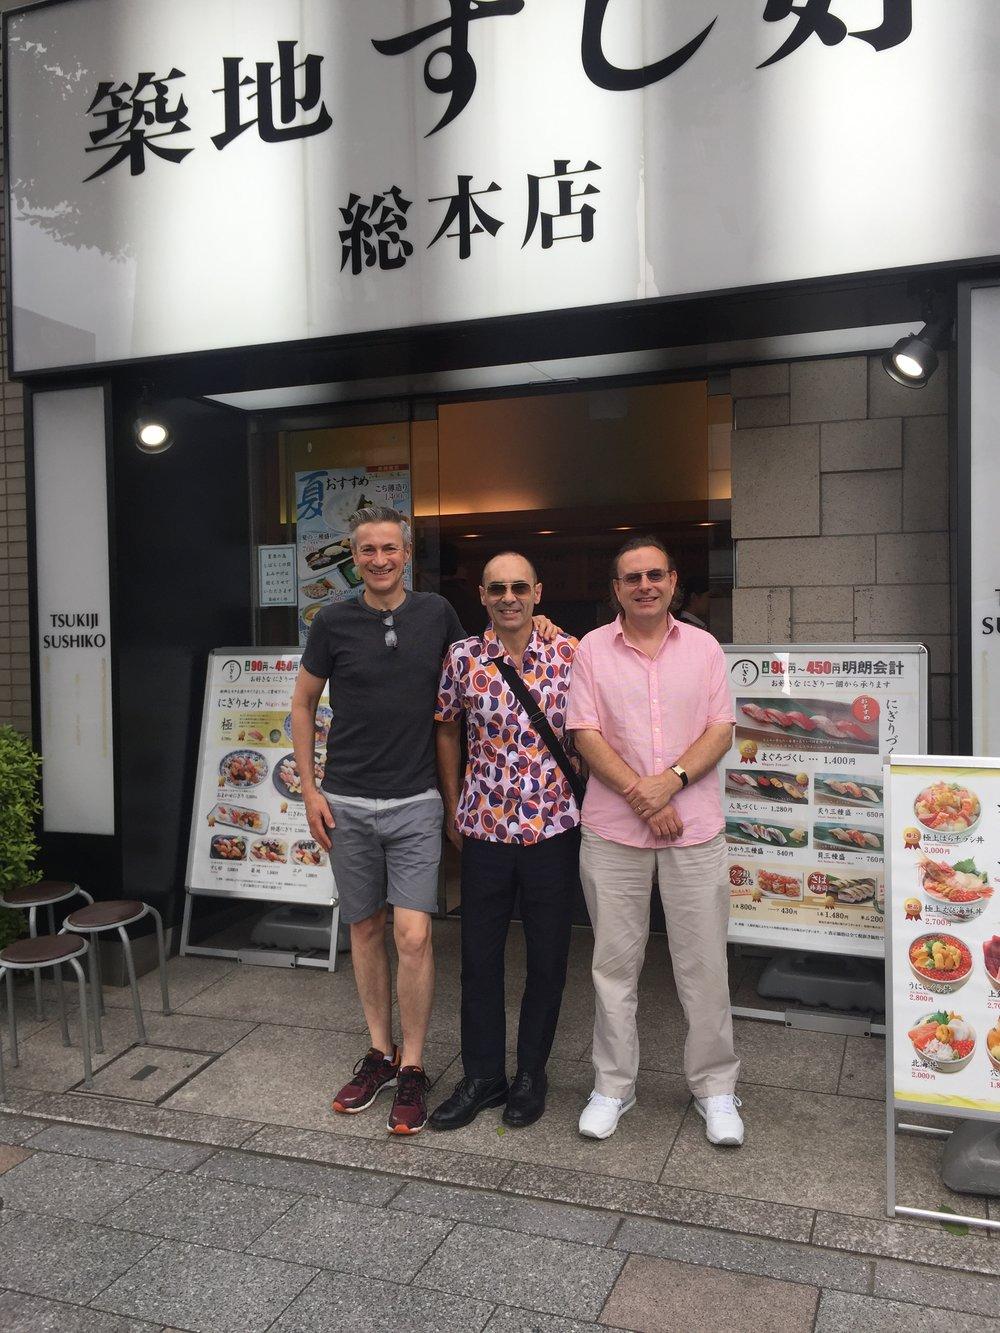 Photo 27-08-2017, 13 21 20.jpg